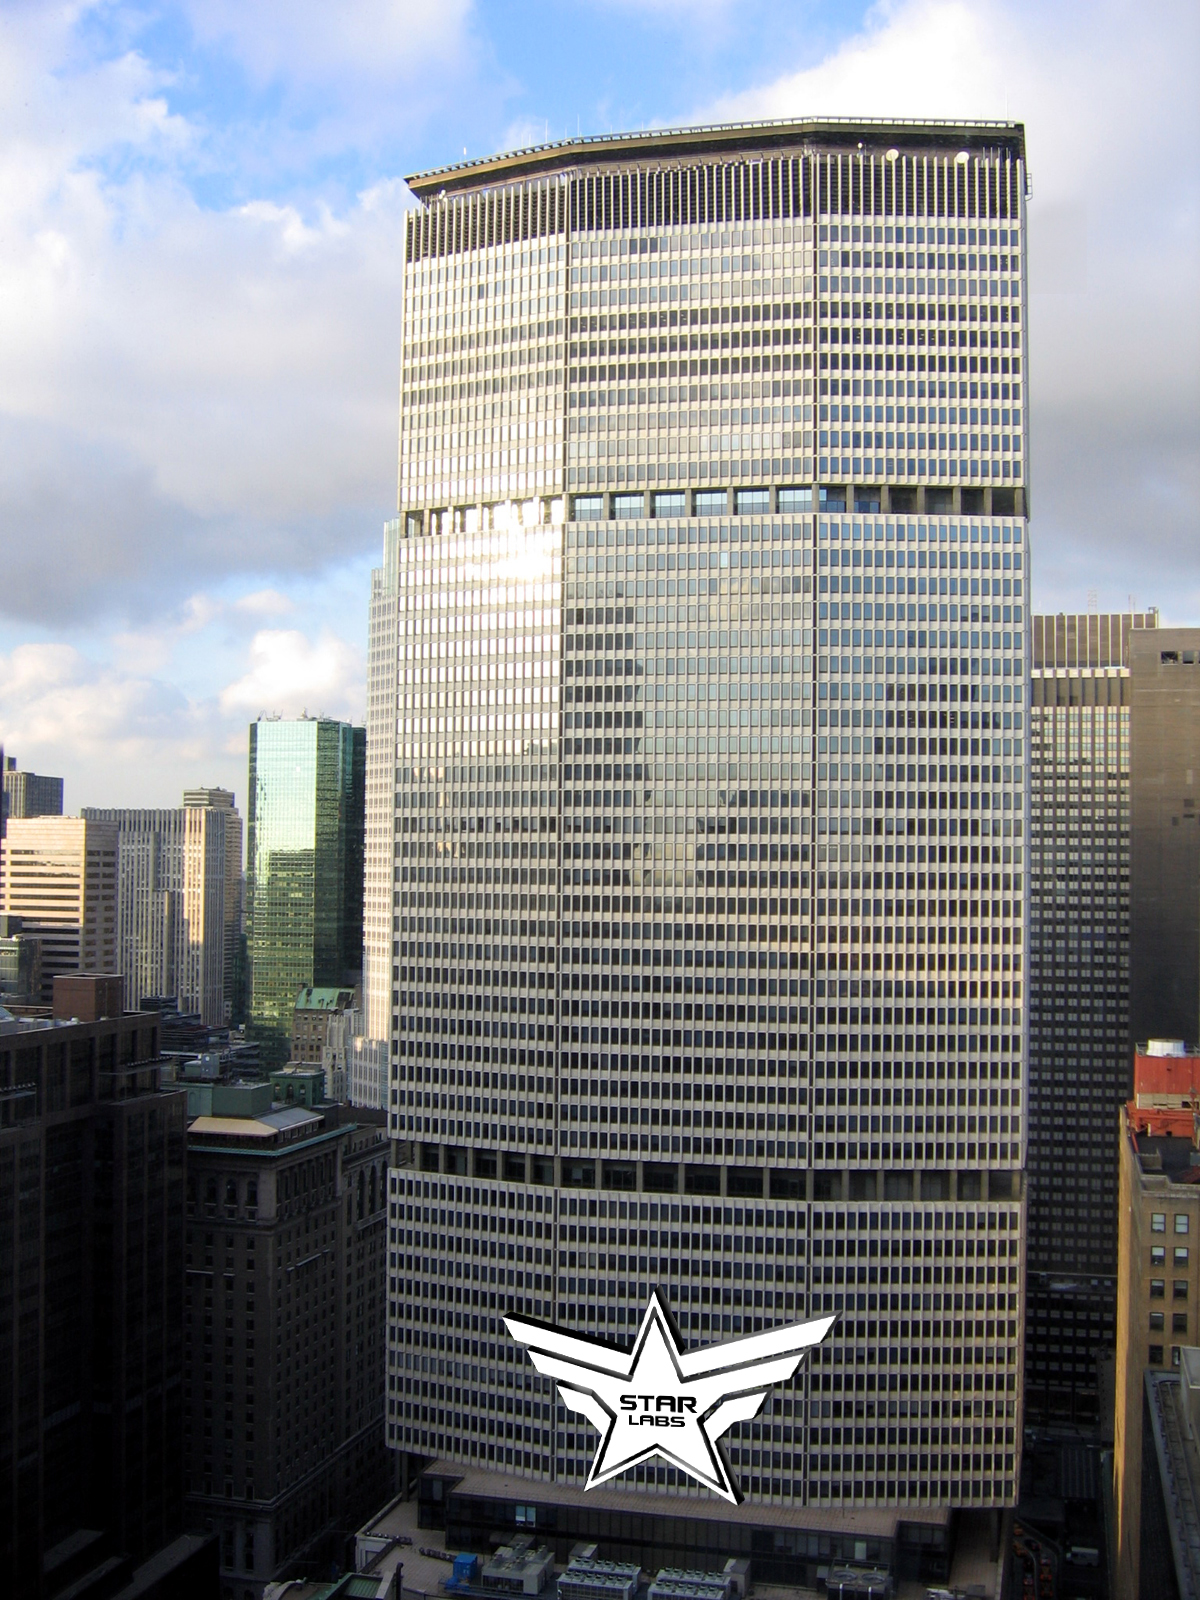 Star Labs Building Metropolis Deleware